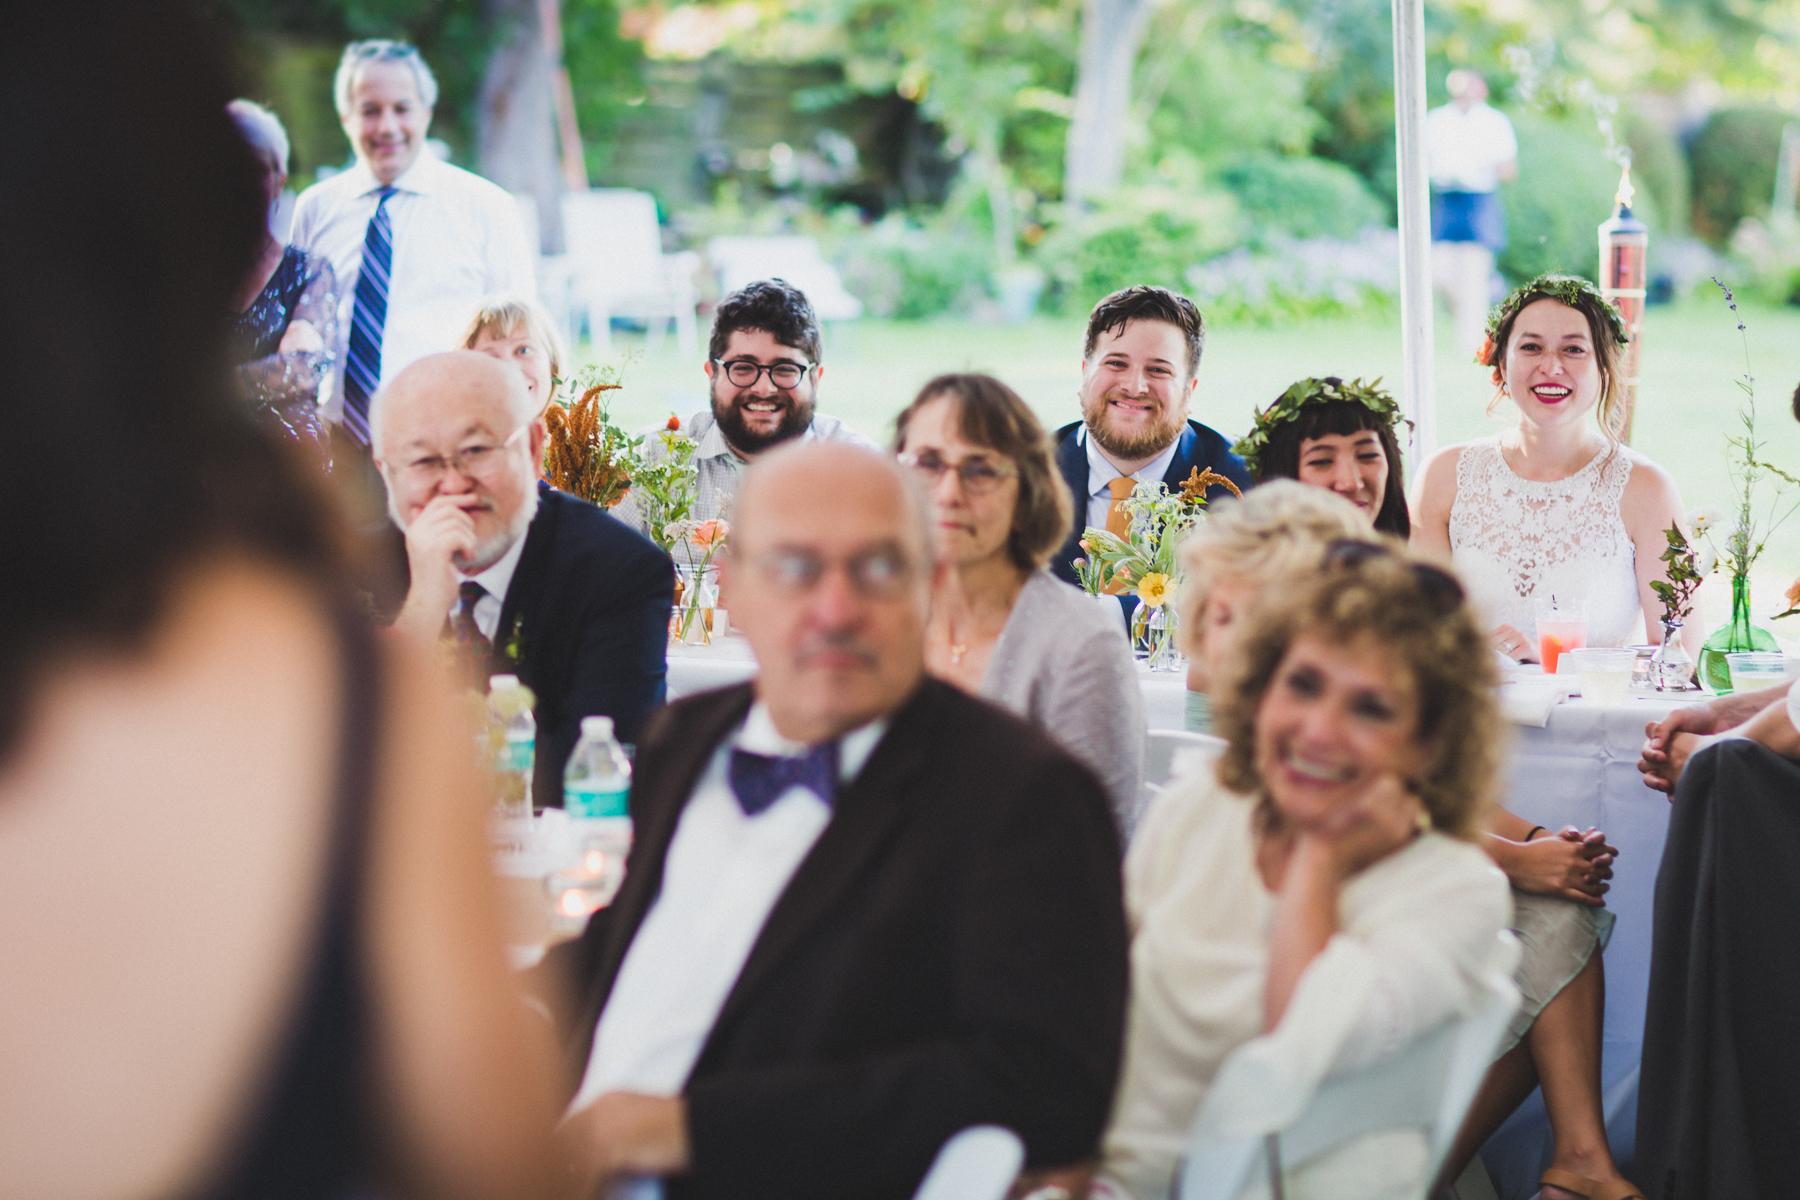 Long-Island-Documentary-Wedding-Photography-Summer-Tent-Wedding-in-New-York-123.jpg